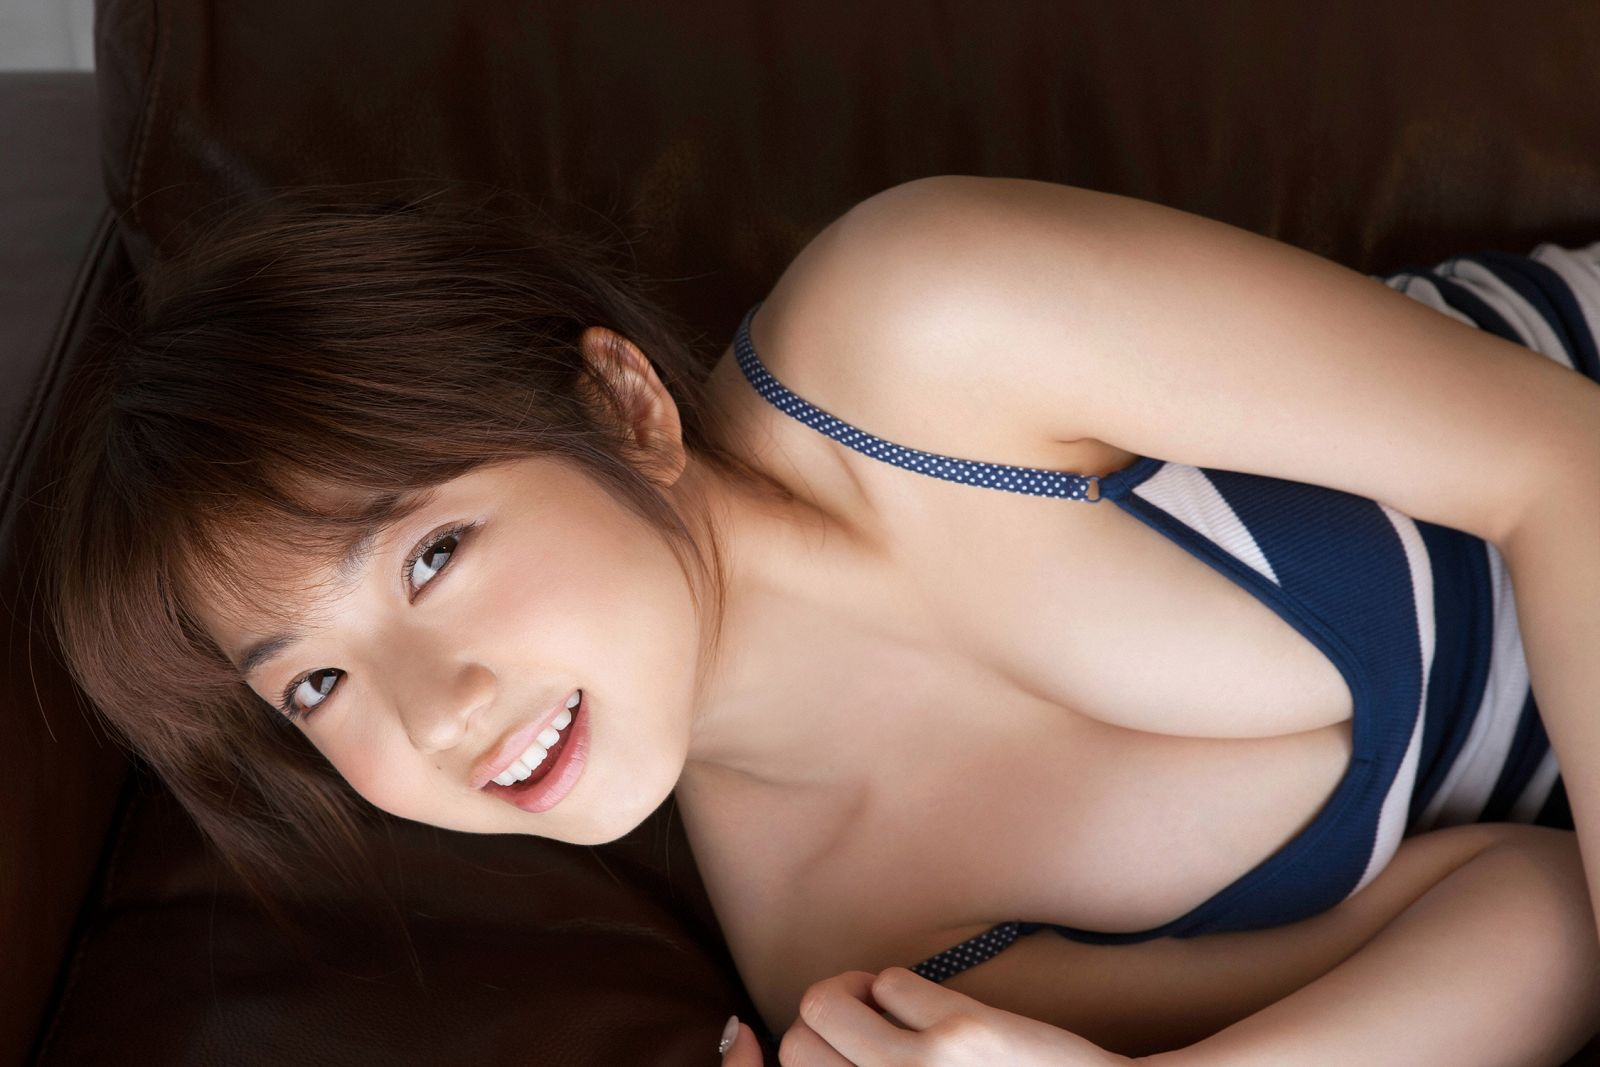 中村静香 画像 19